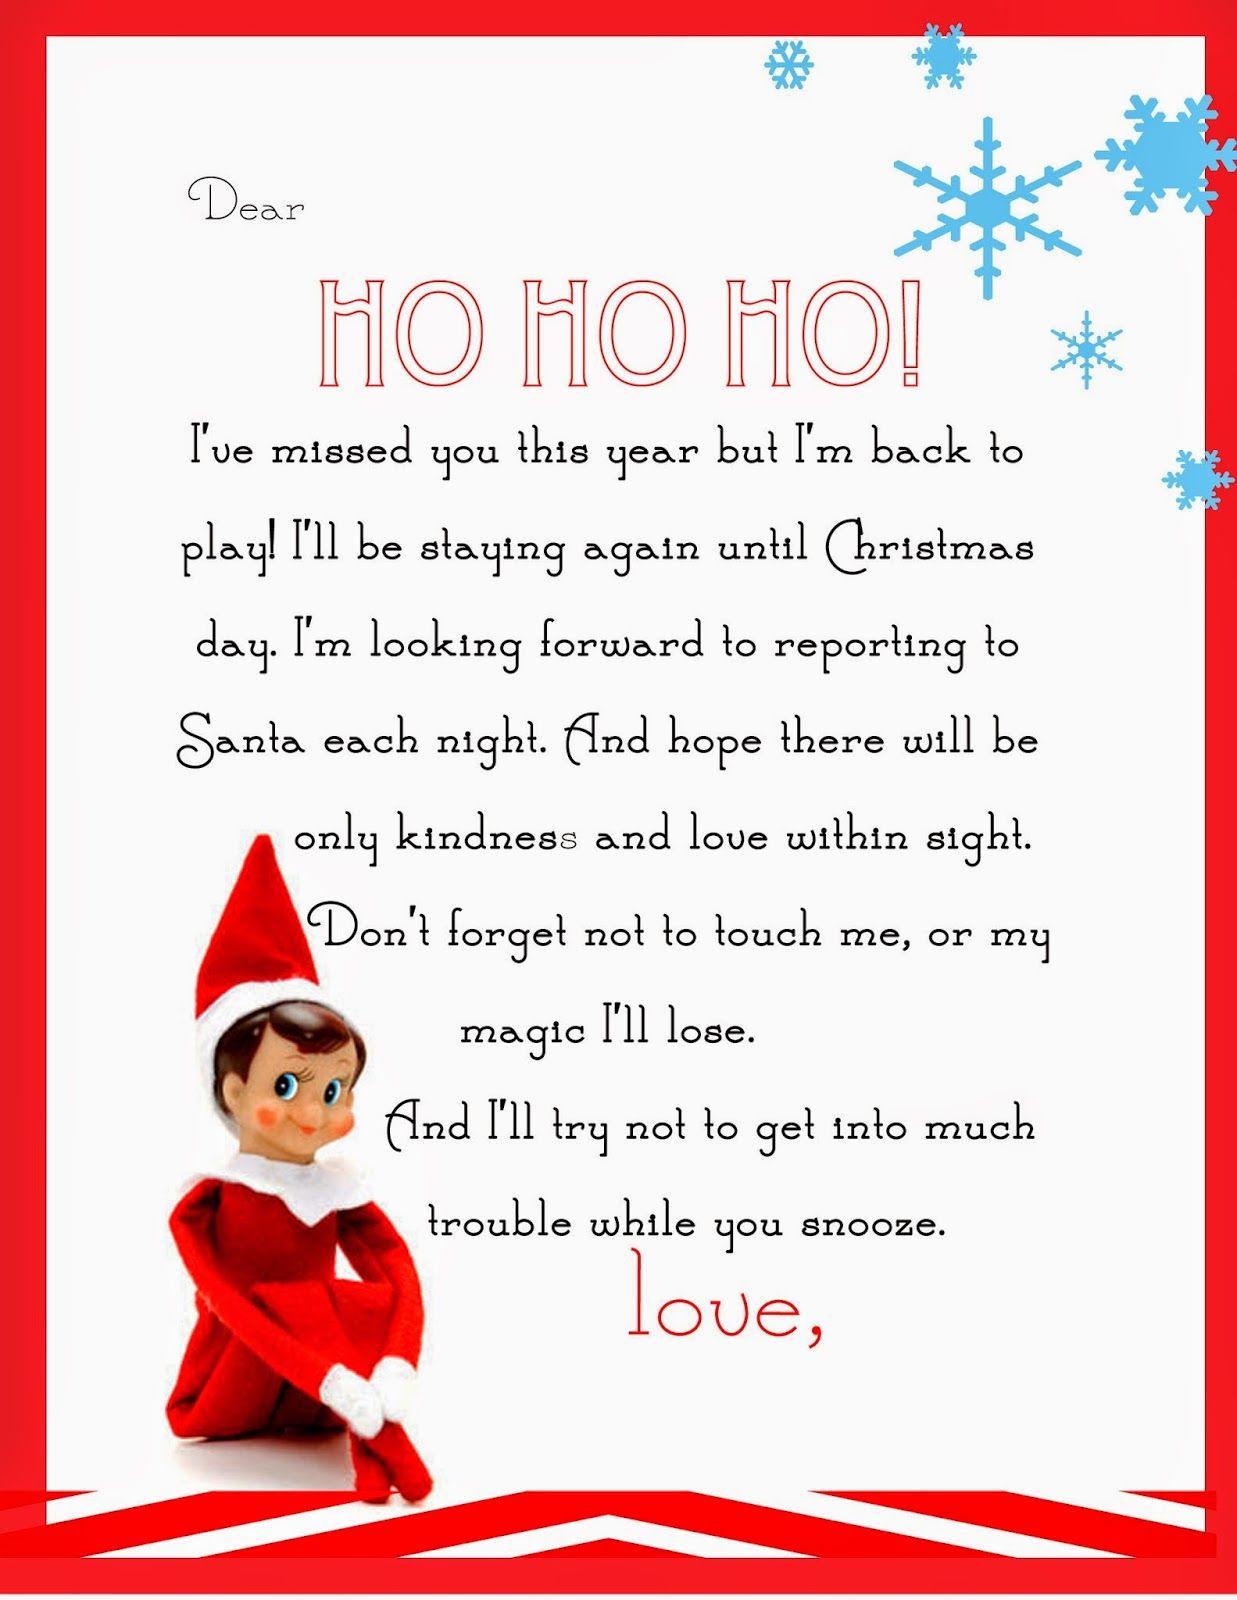 Elf On The Shelf Letter {Free Printable}   Para Las Muñecas - Elf On A Shelf Goodbye Letter Free Printable